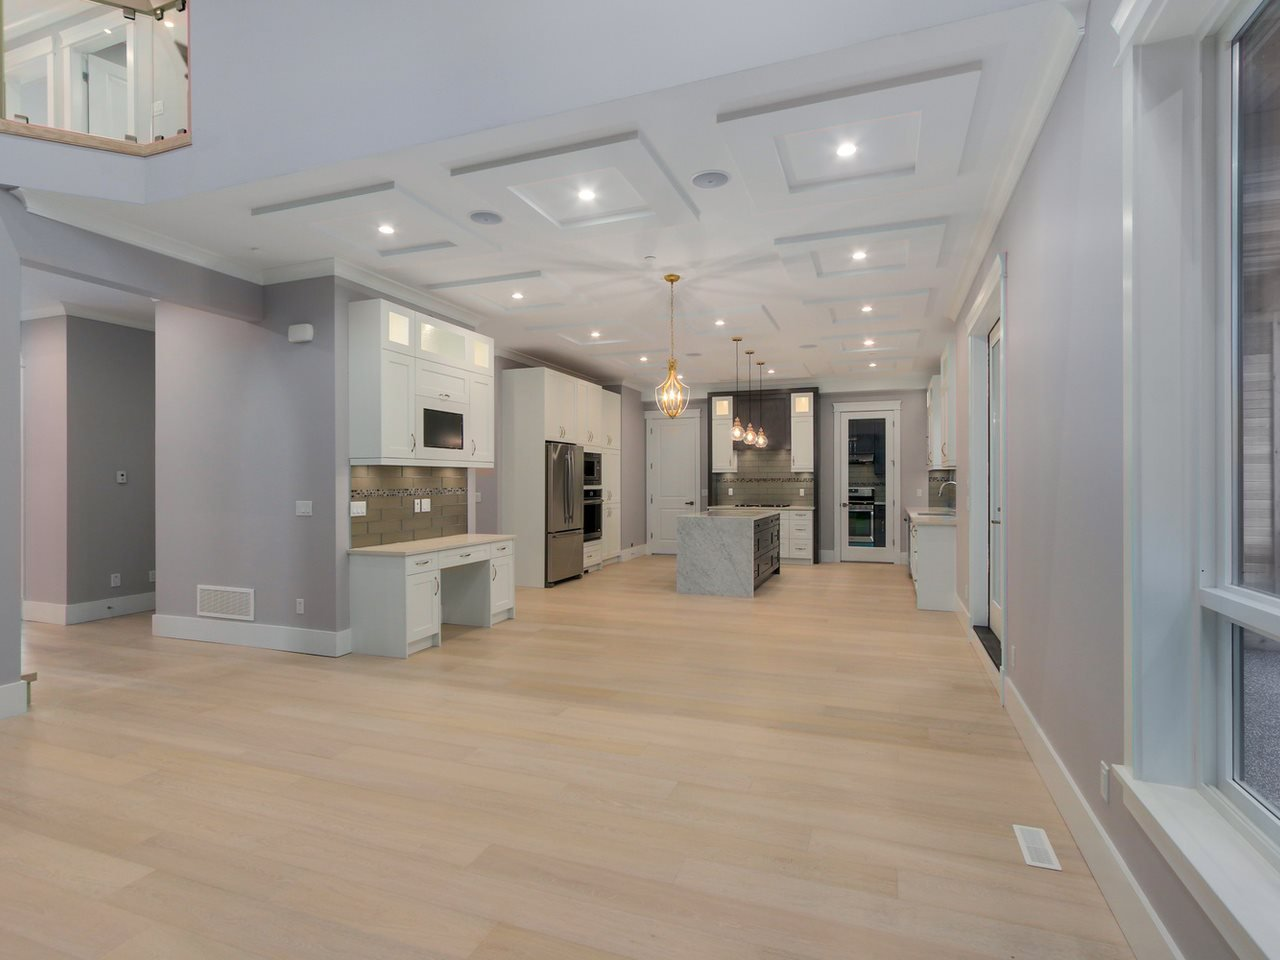 Photo 7: Photos: 1560 MAPLE Street: White Rock House for sale (South Surrey White Rock)  : MLS®# R2138926